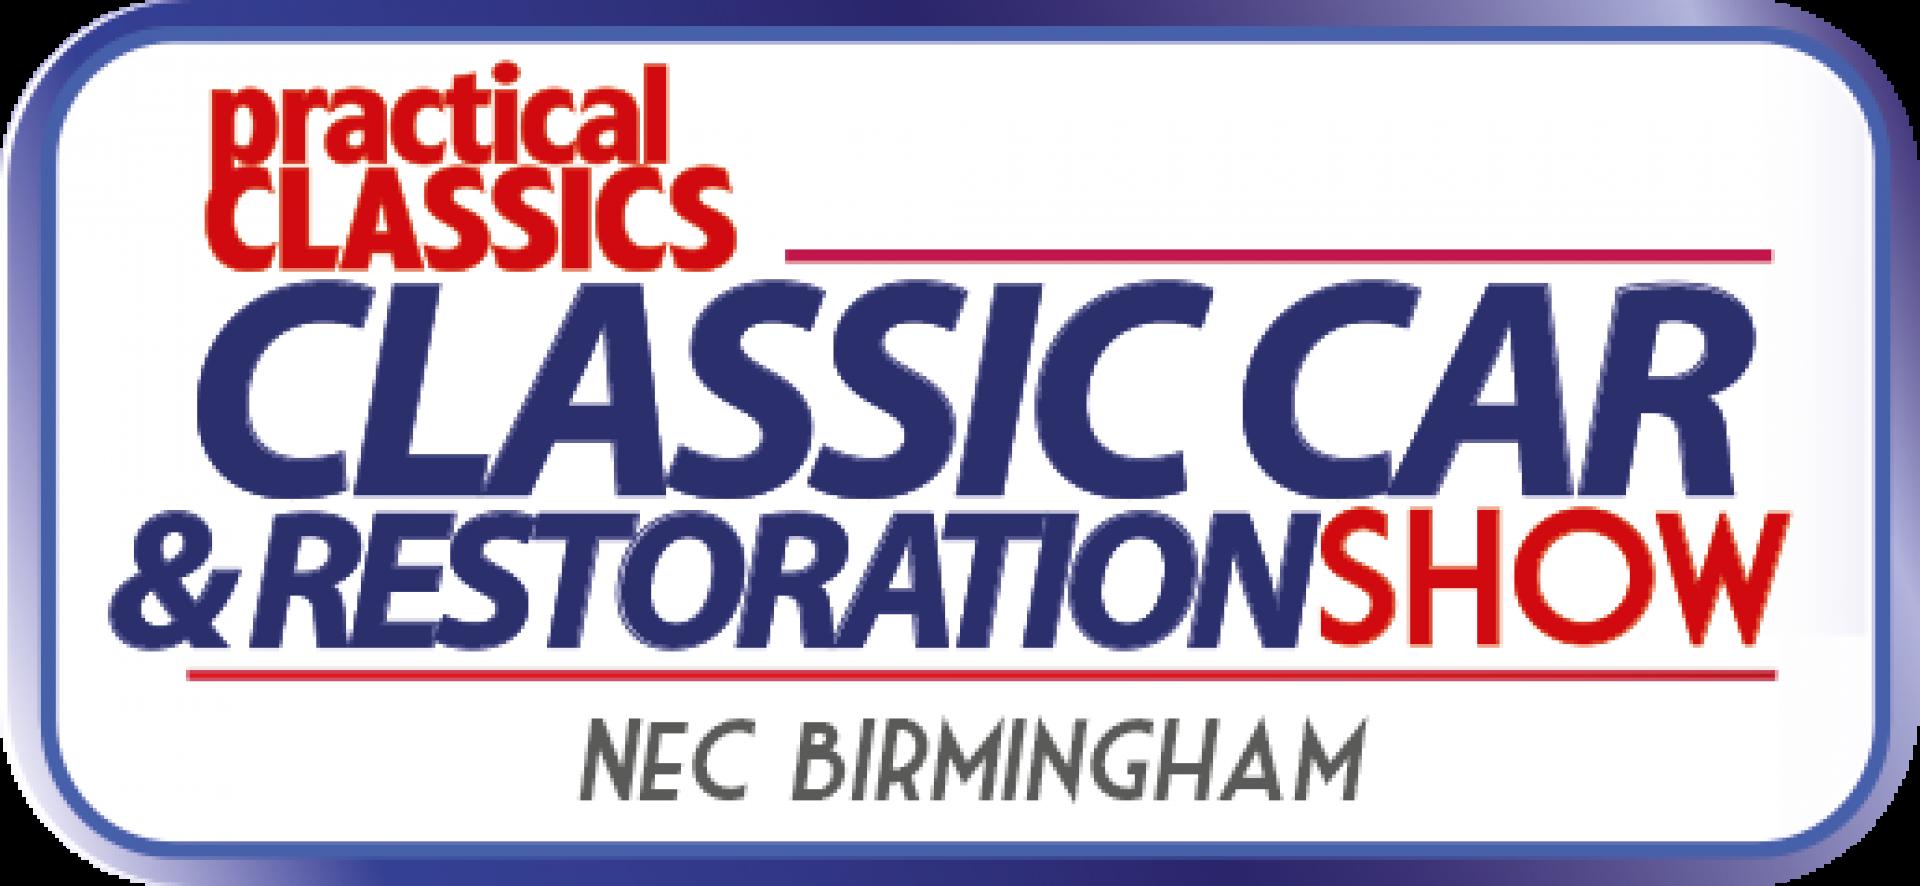 Restoration Tradeshow - NEC, Birmingham